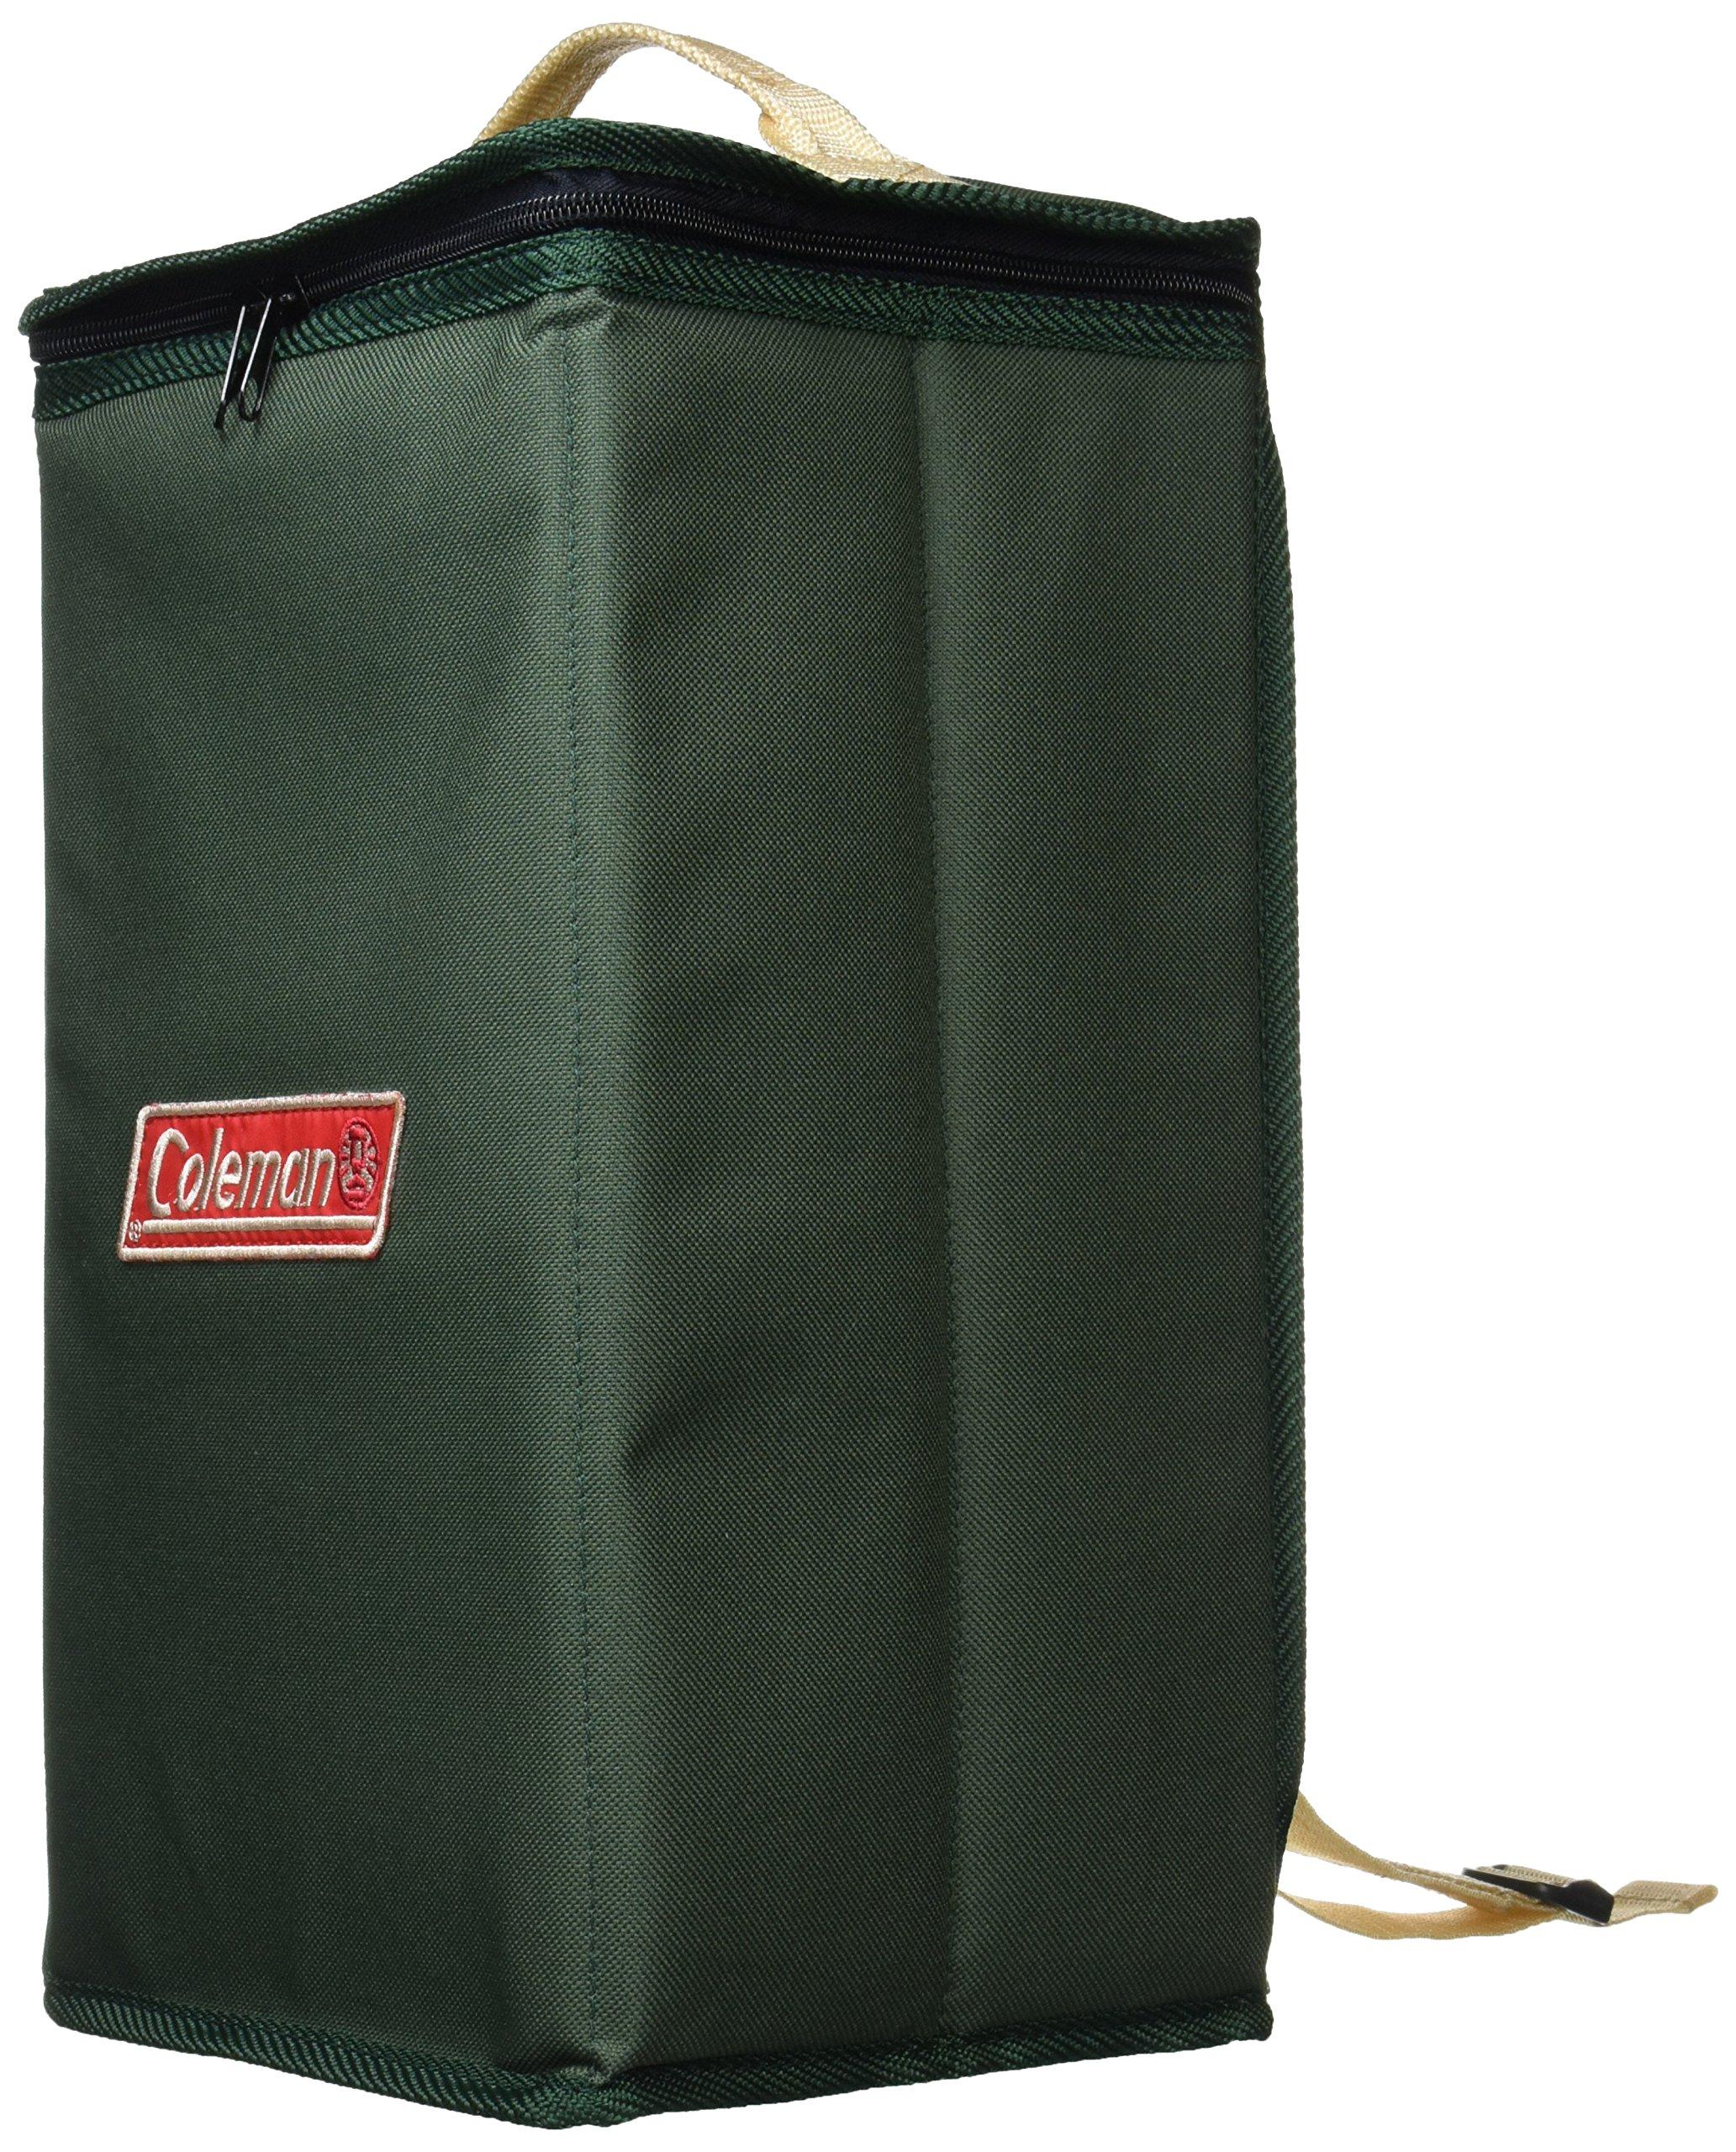 Coleman (Coleman) soft lantern Case 2 170-8017